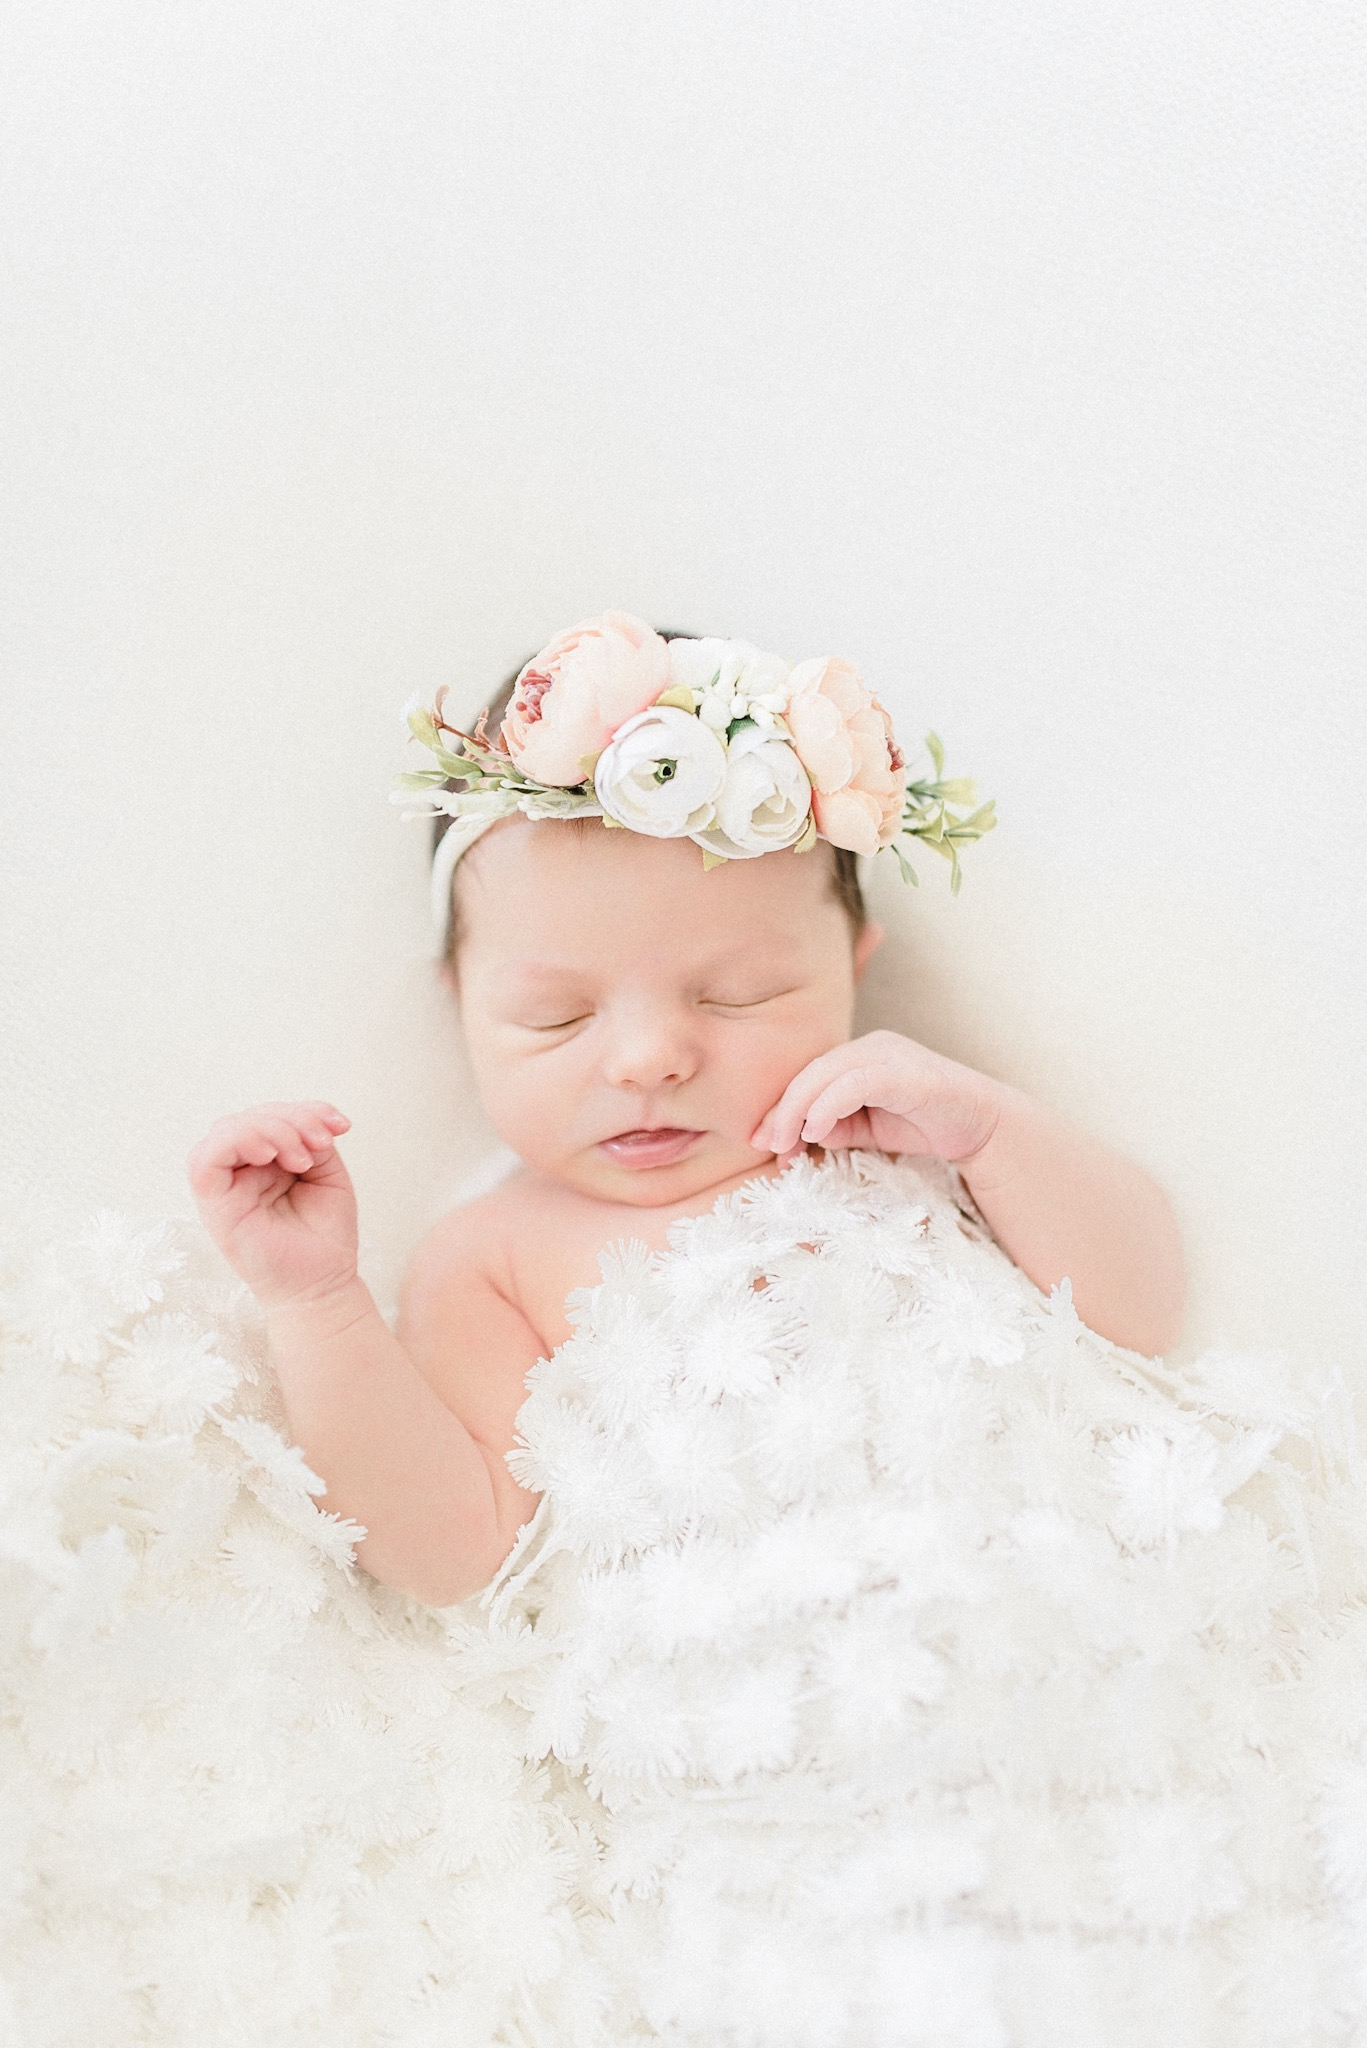 Lauren | Light & Airy Newborn Photography | Noblesville Photographer